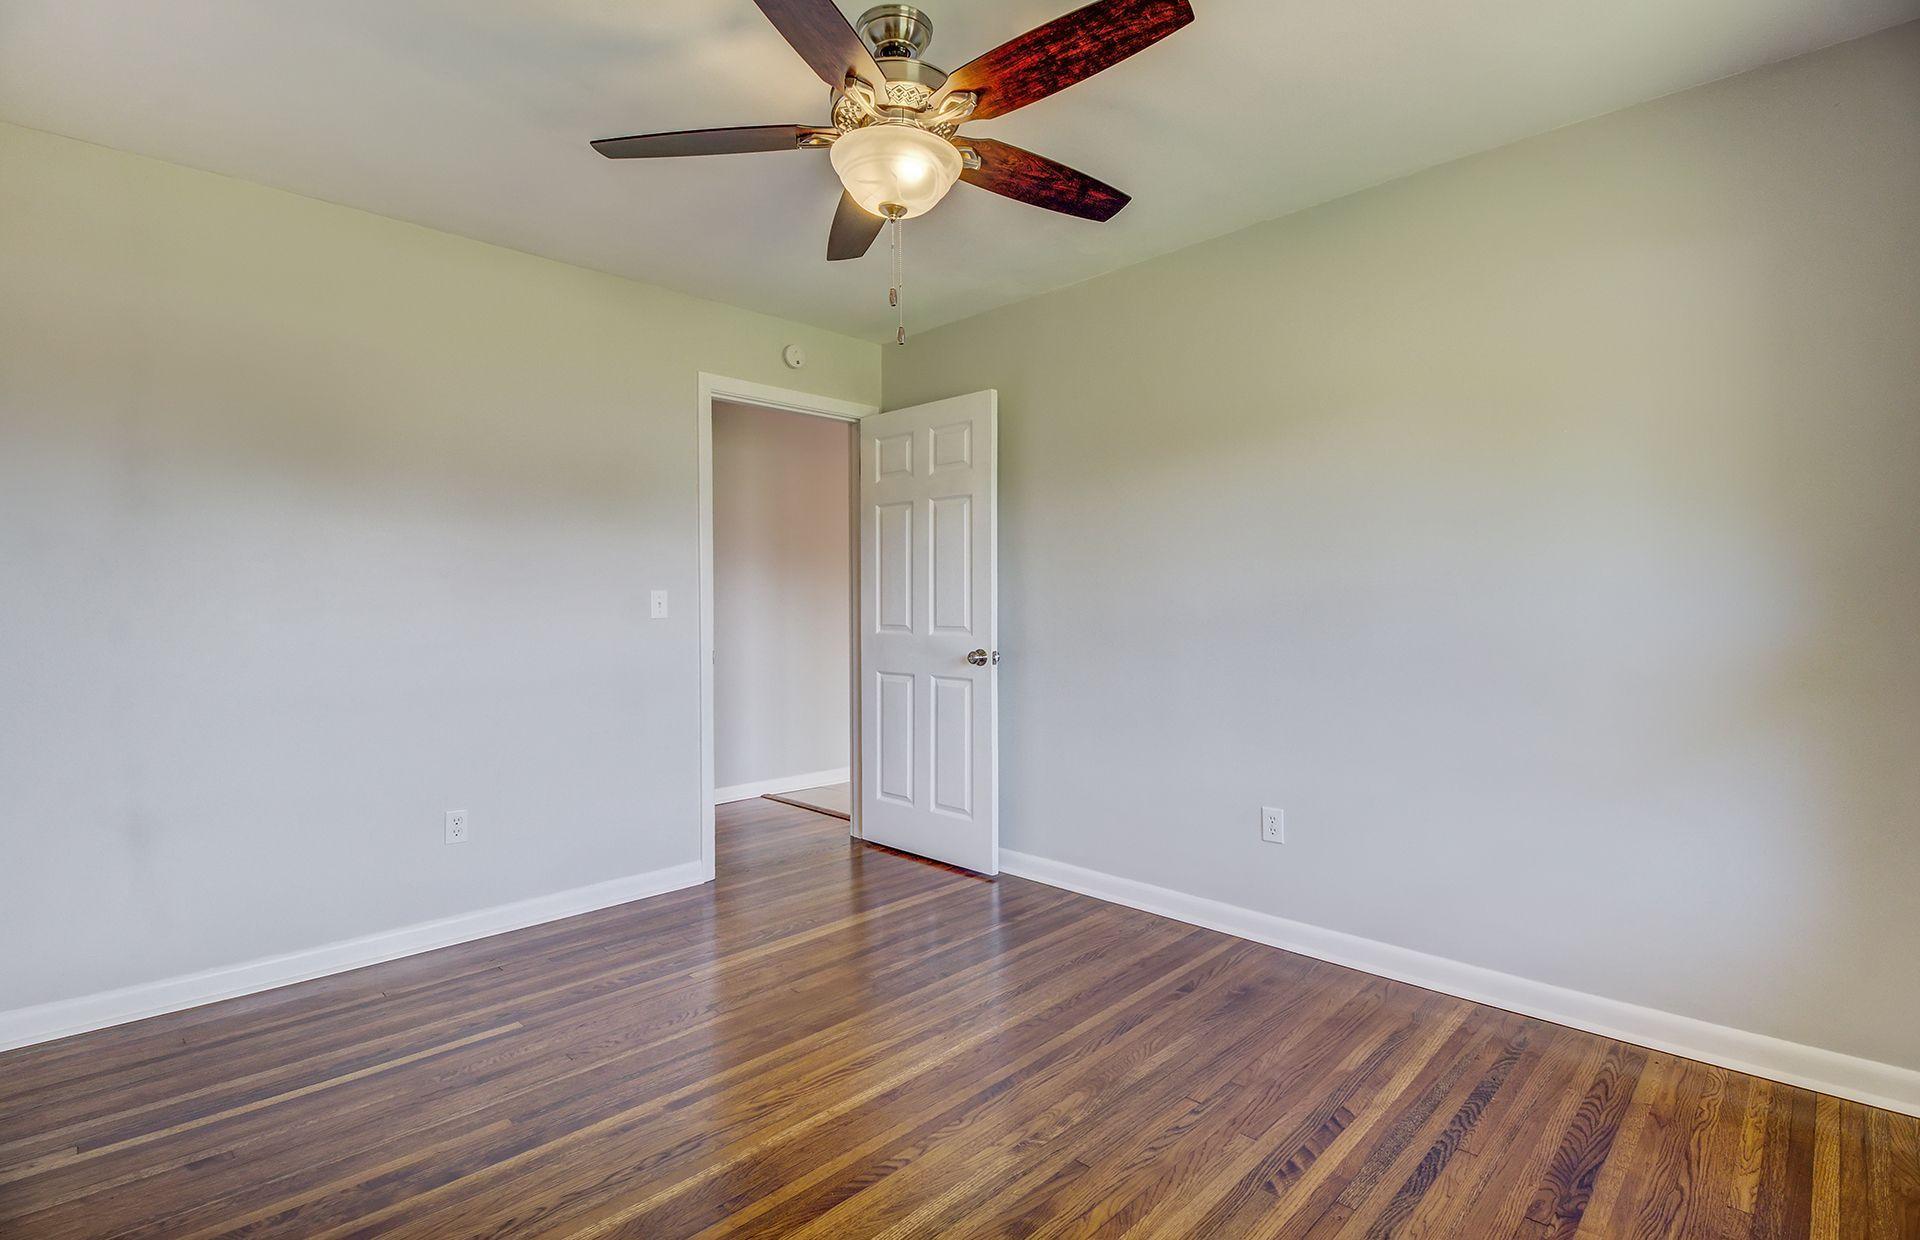 Belvedere Estates Homes For Sale - 6010 Ridgecrest, Hanahan, SC - 33